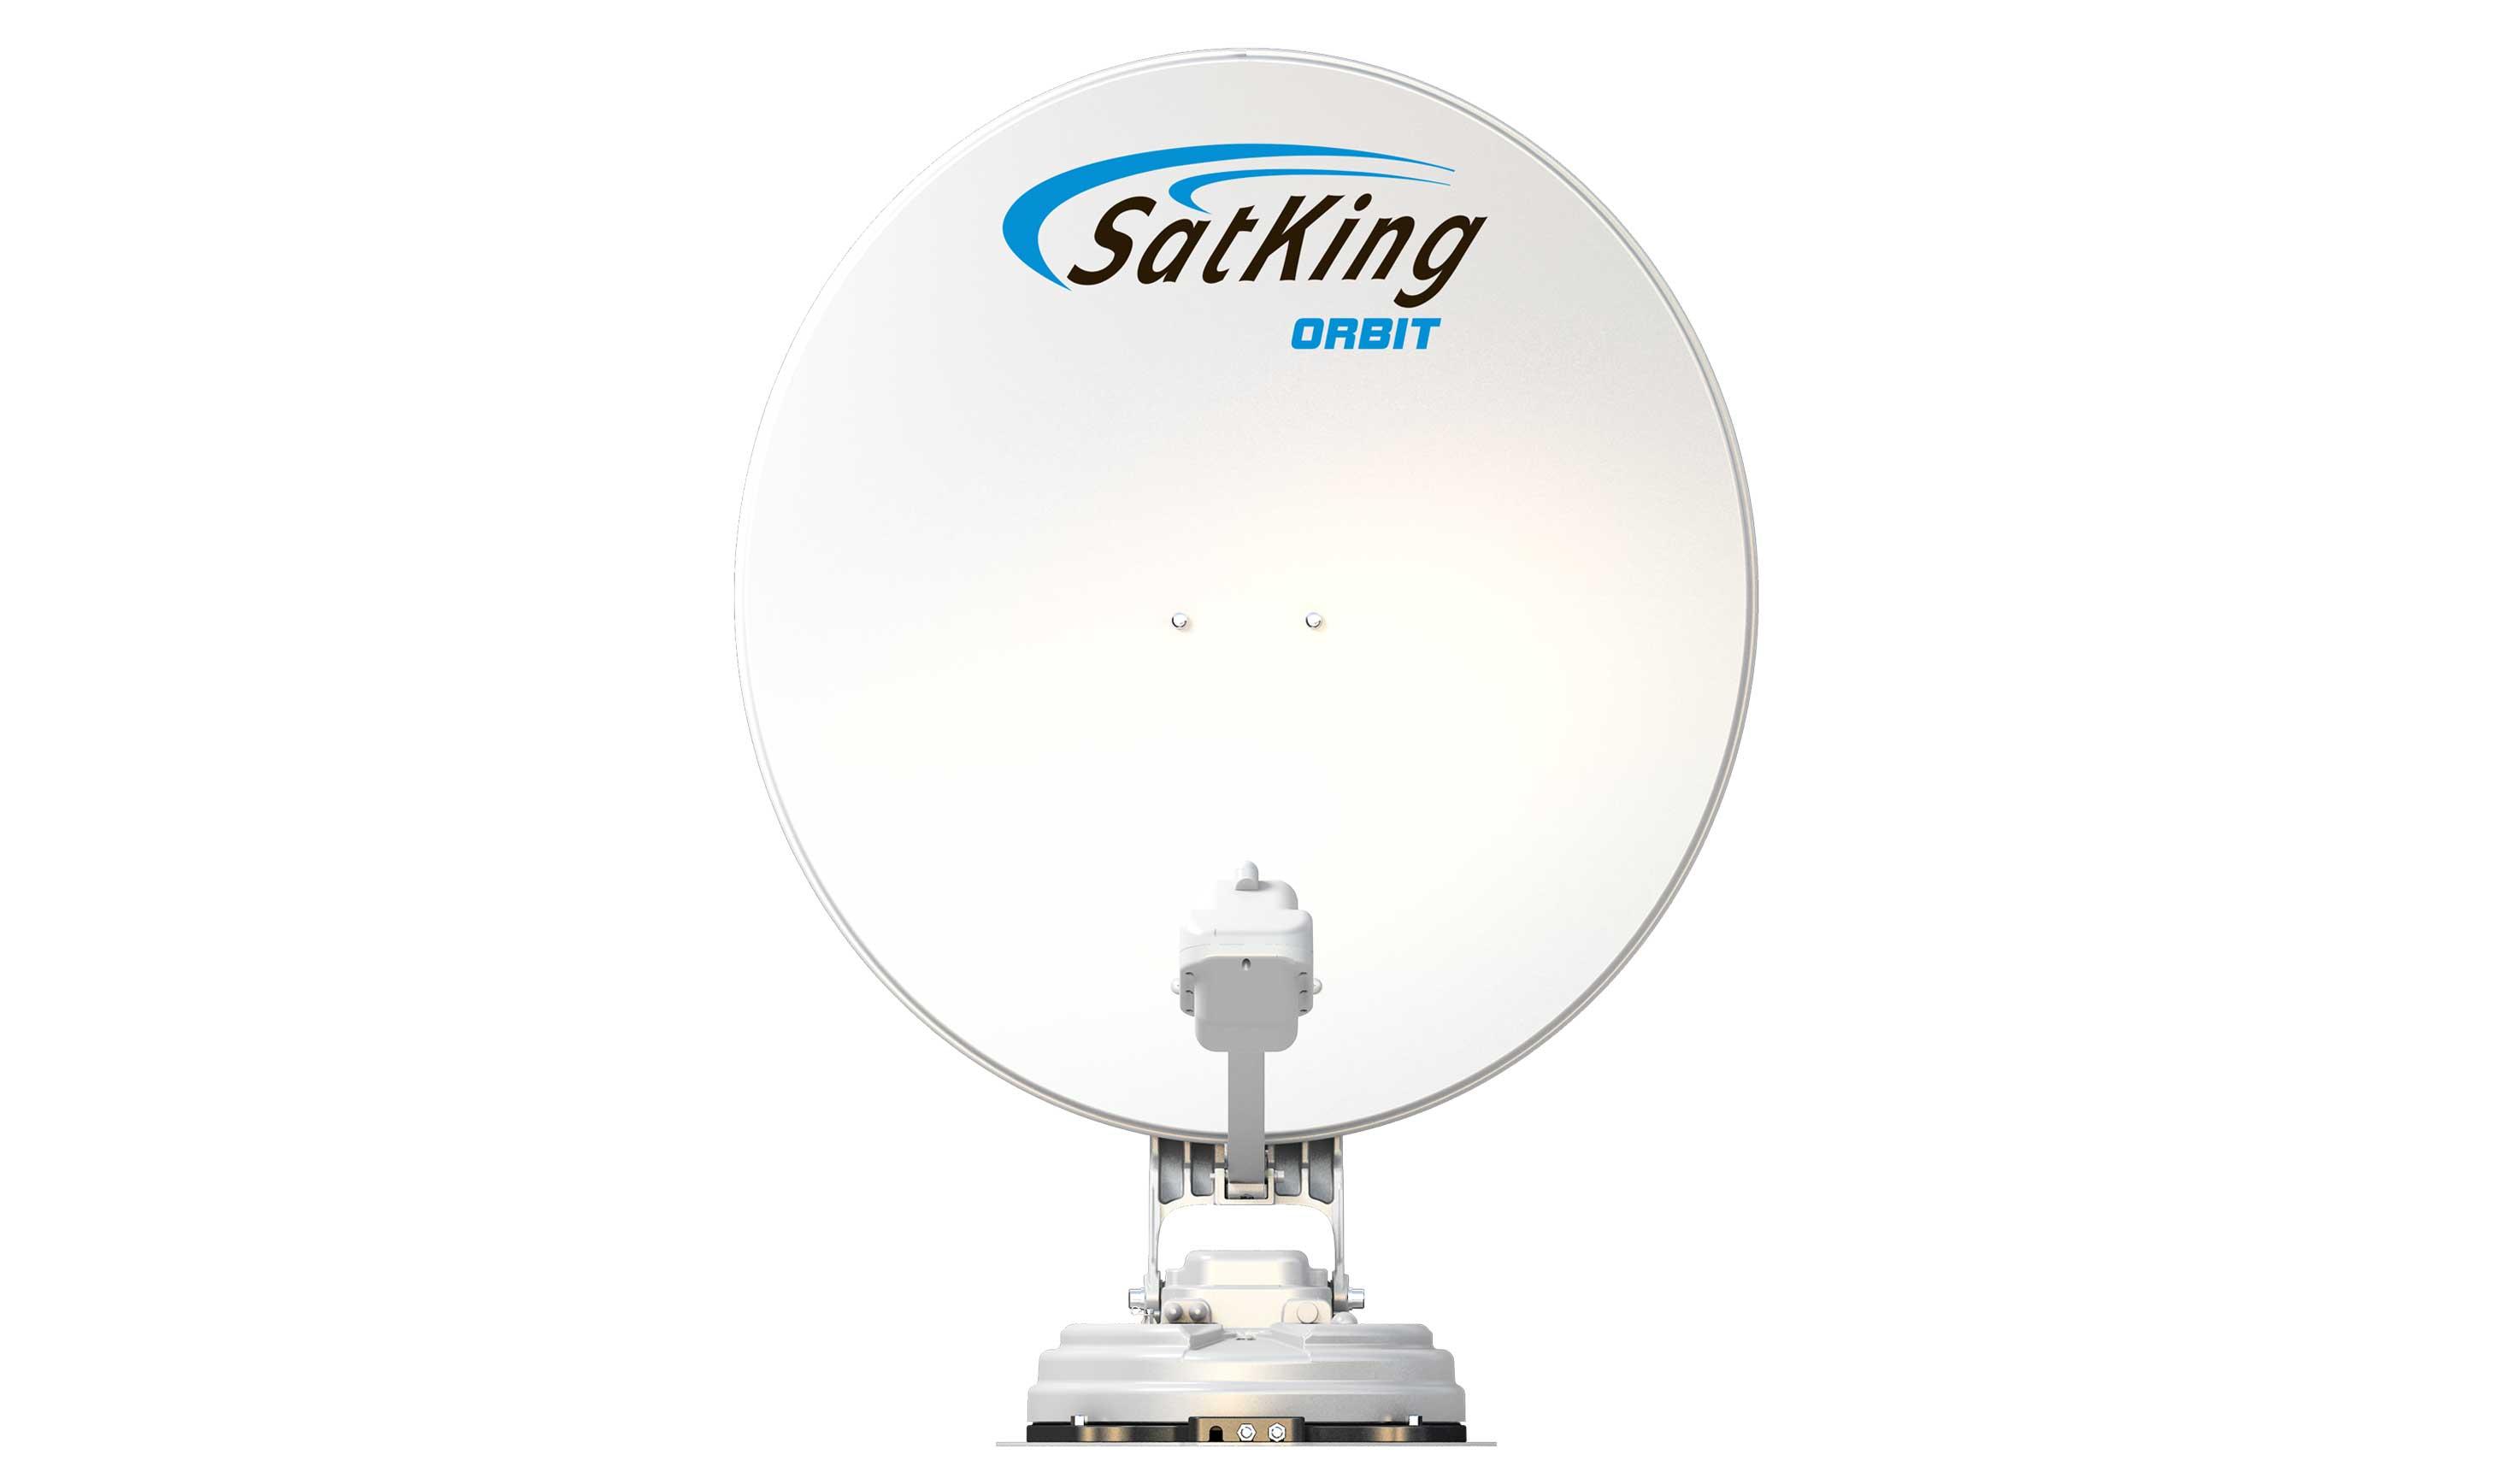 Satking Orbit Fully Automatic Satellite TV System